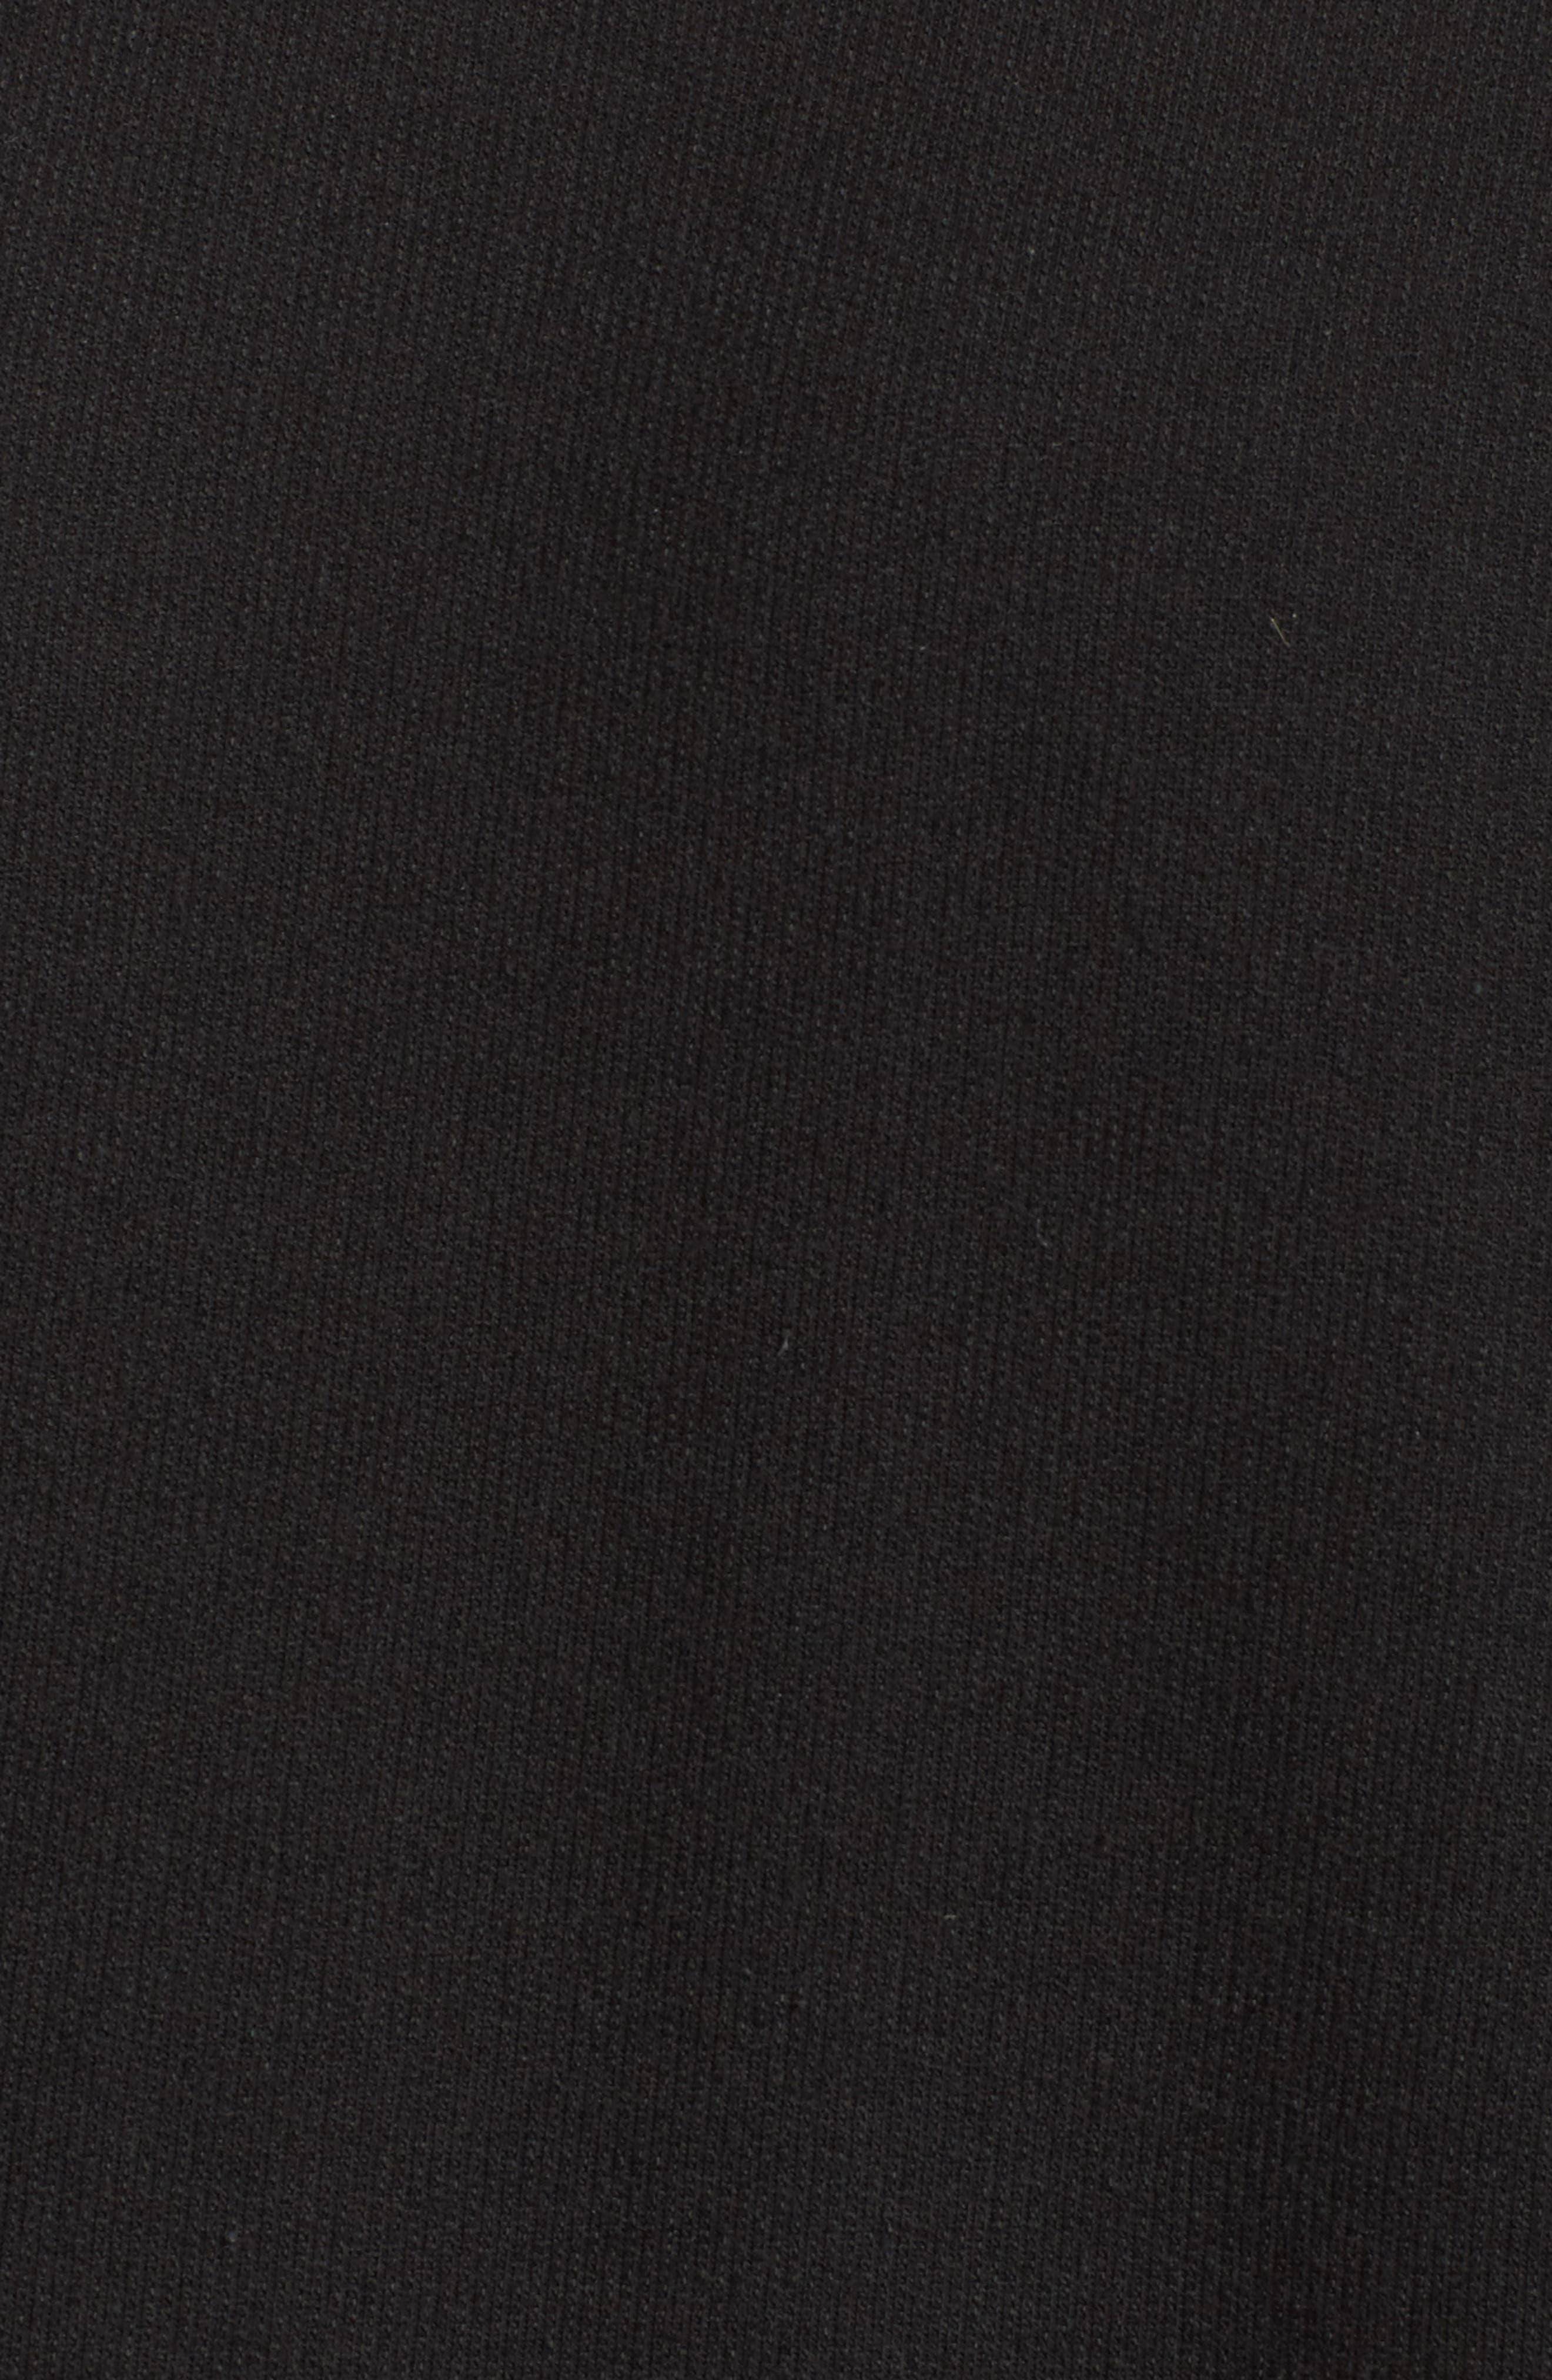 Soph Lounge Sweater,                             Alternate thumbnail 7, color,                             Plain Black Marle